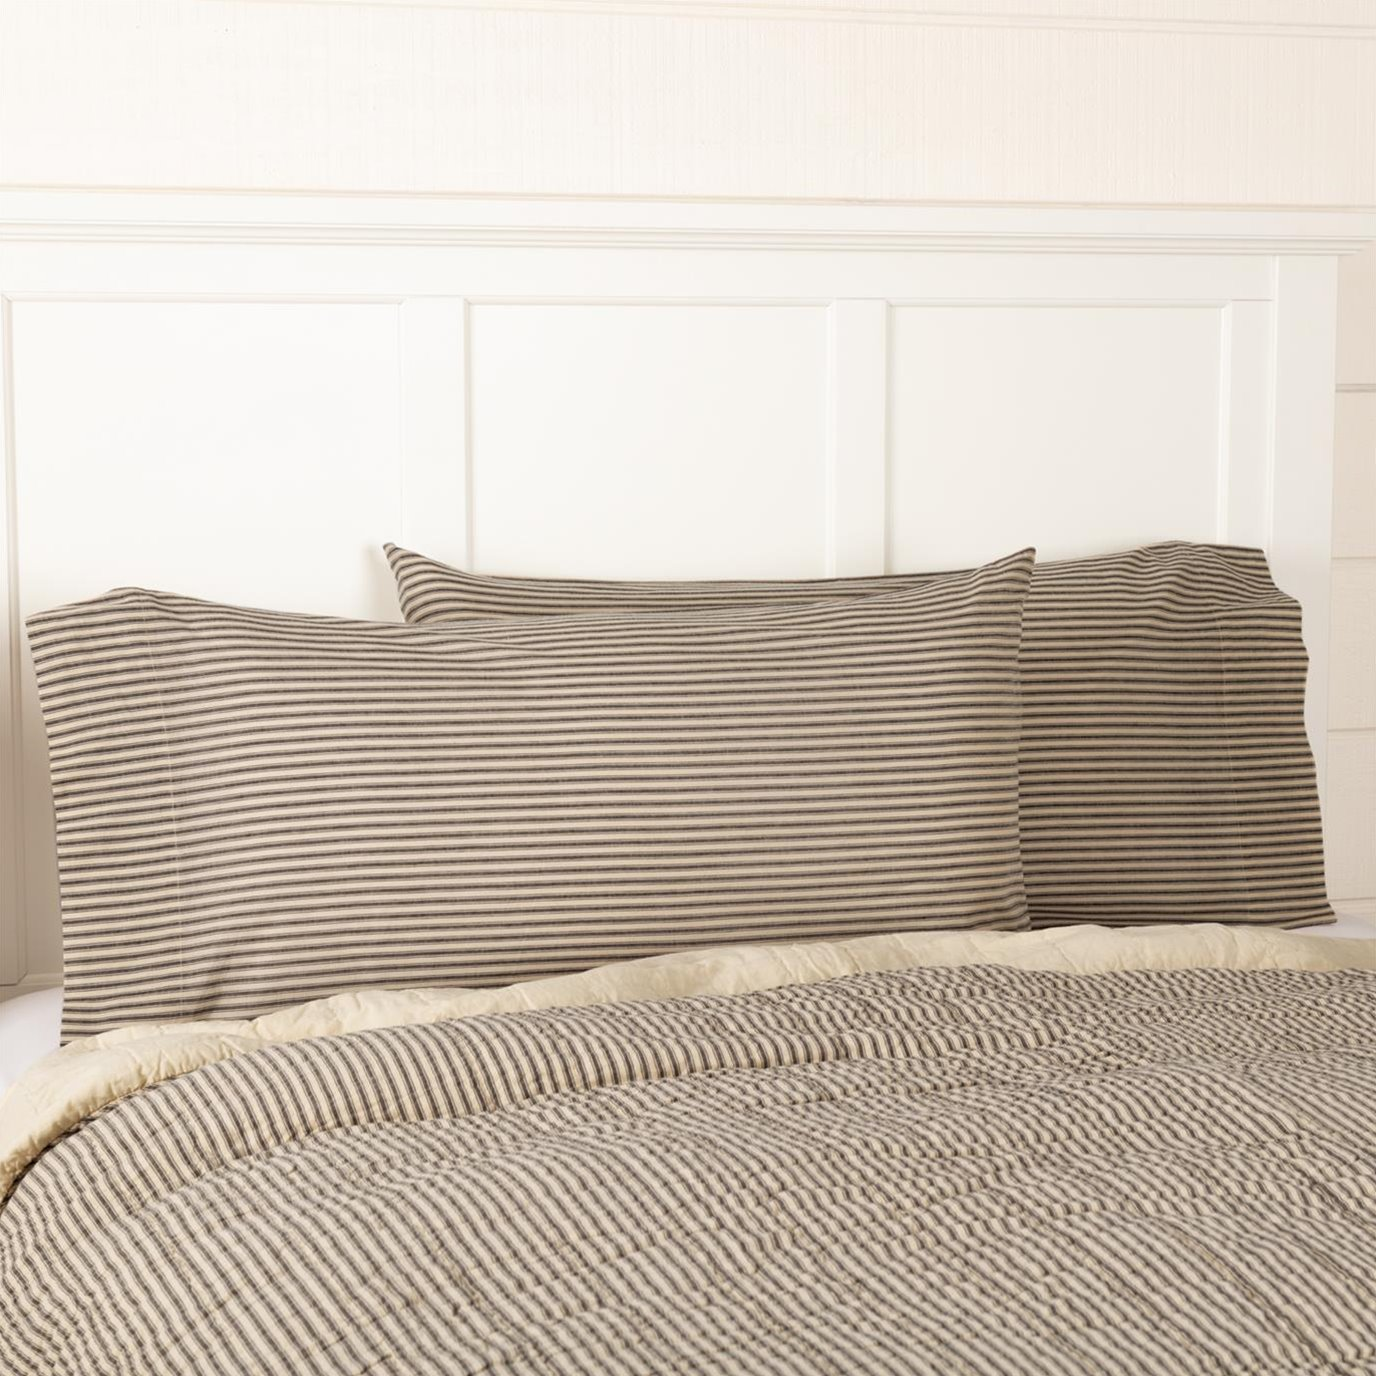 Sawyer Mill Charcoal Ticking Stripe King Pillow Case Set of 2 21x40